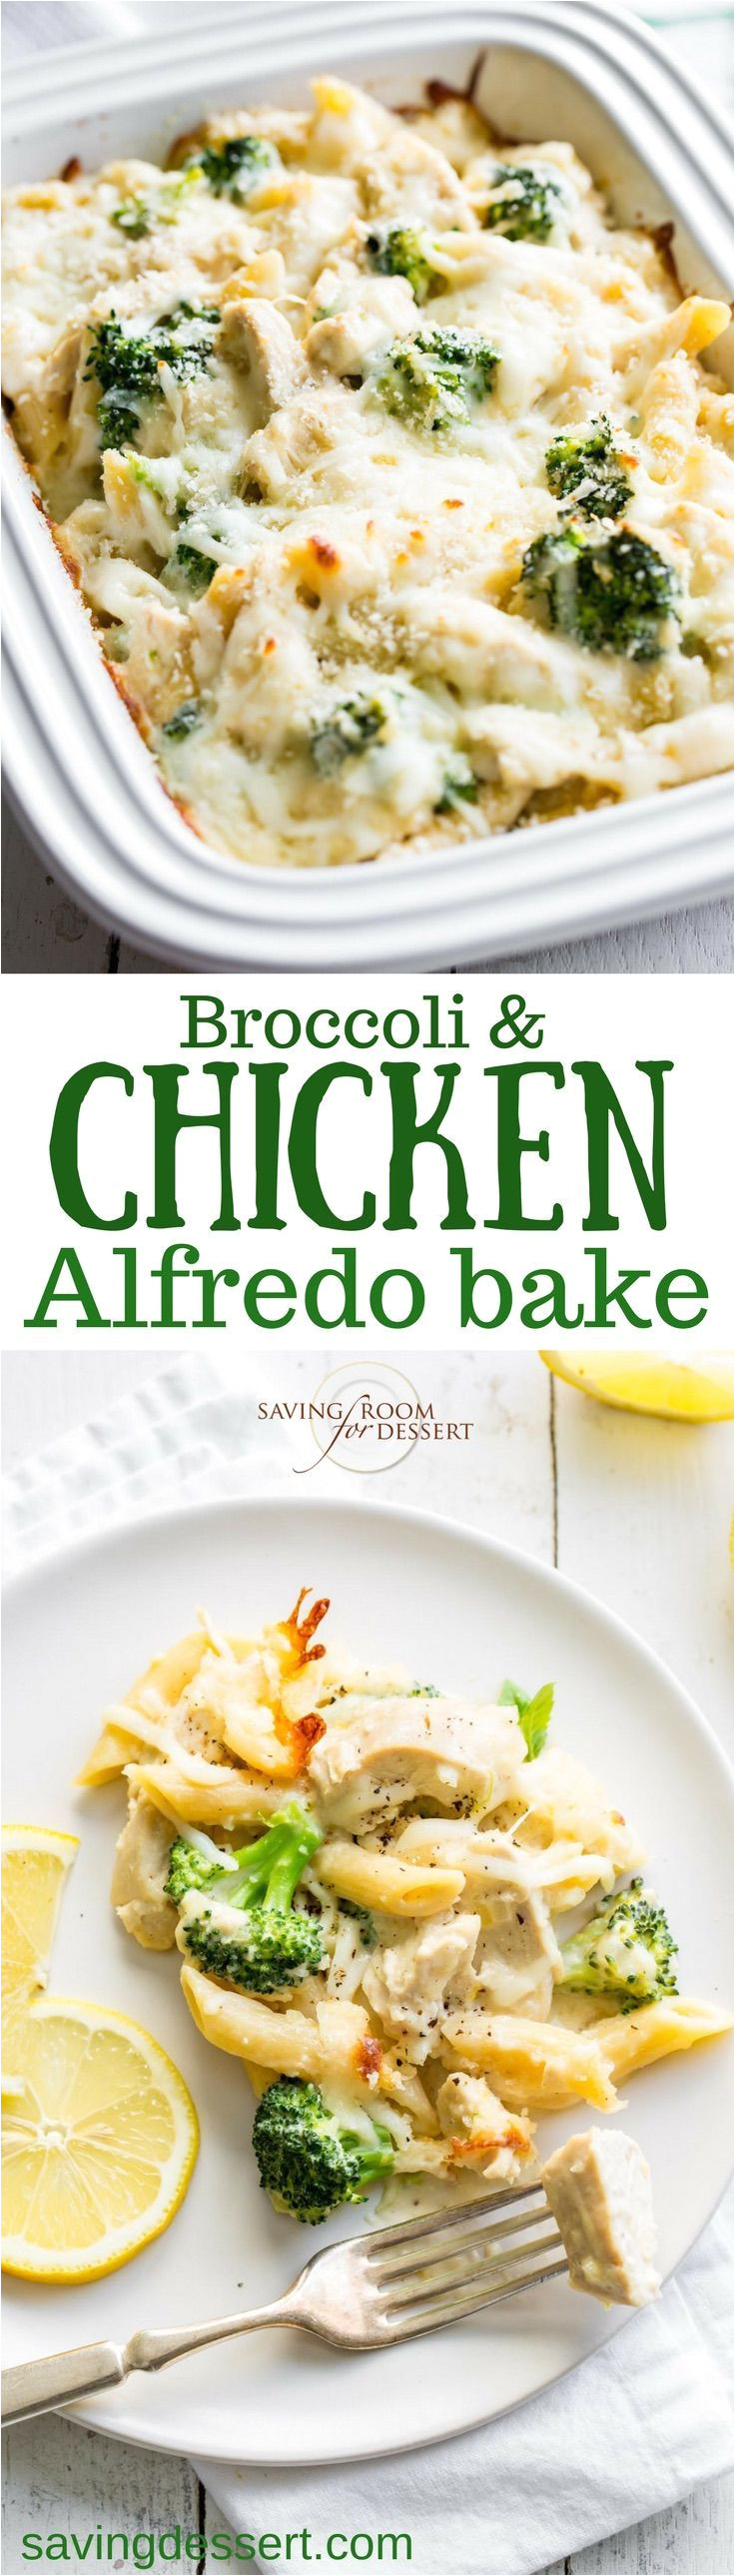 broccoli chicken alfredo bake